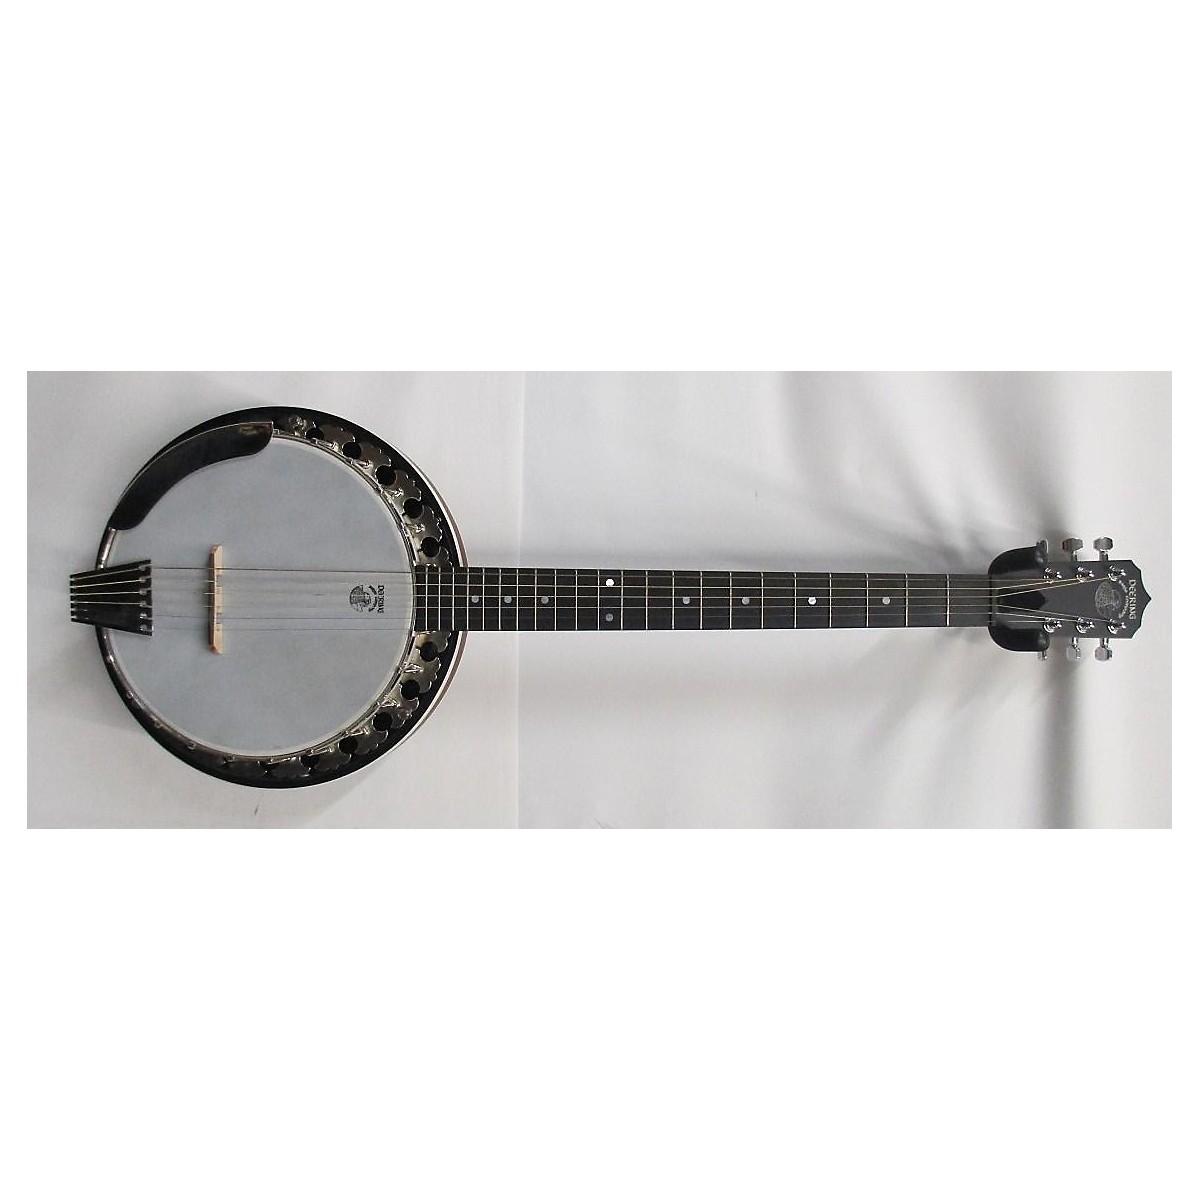 Deering Bostin Six Banjo